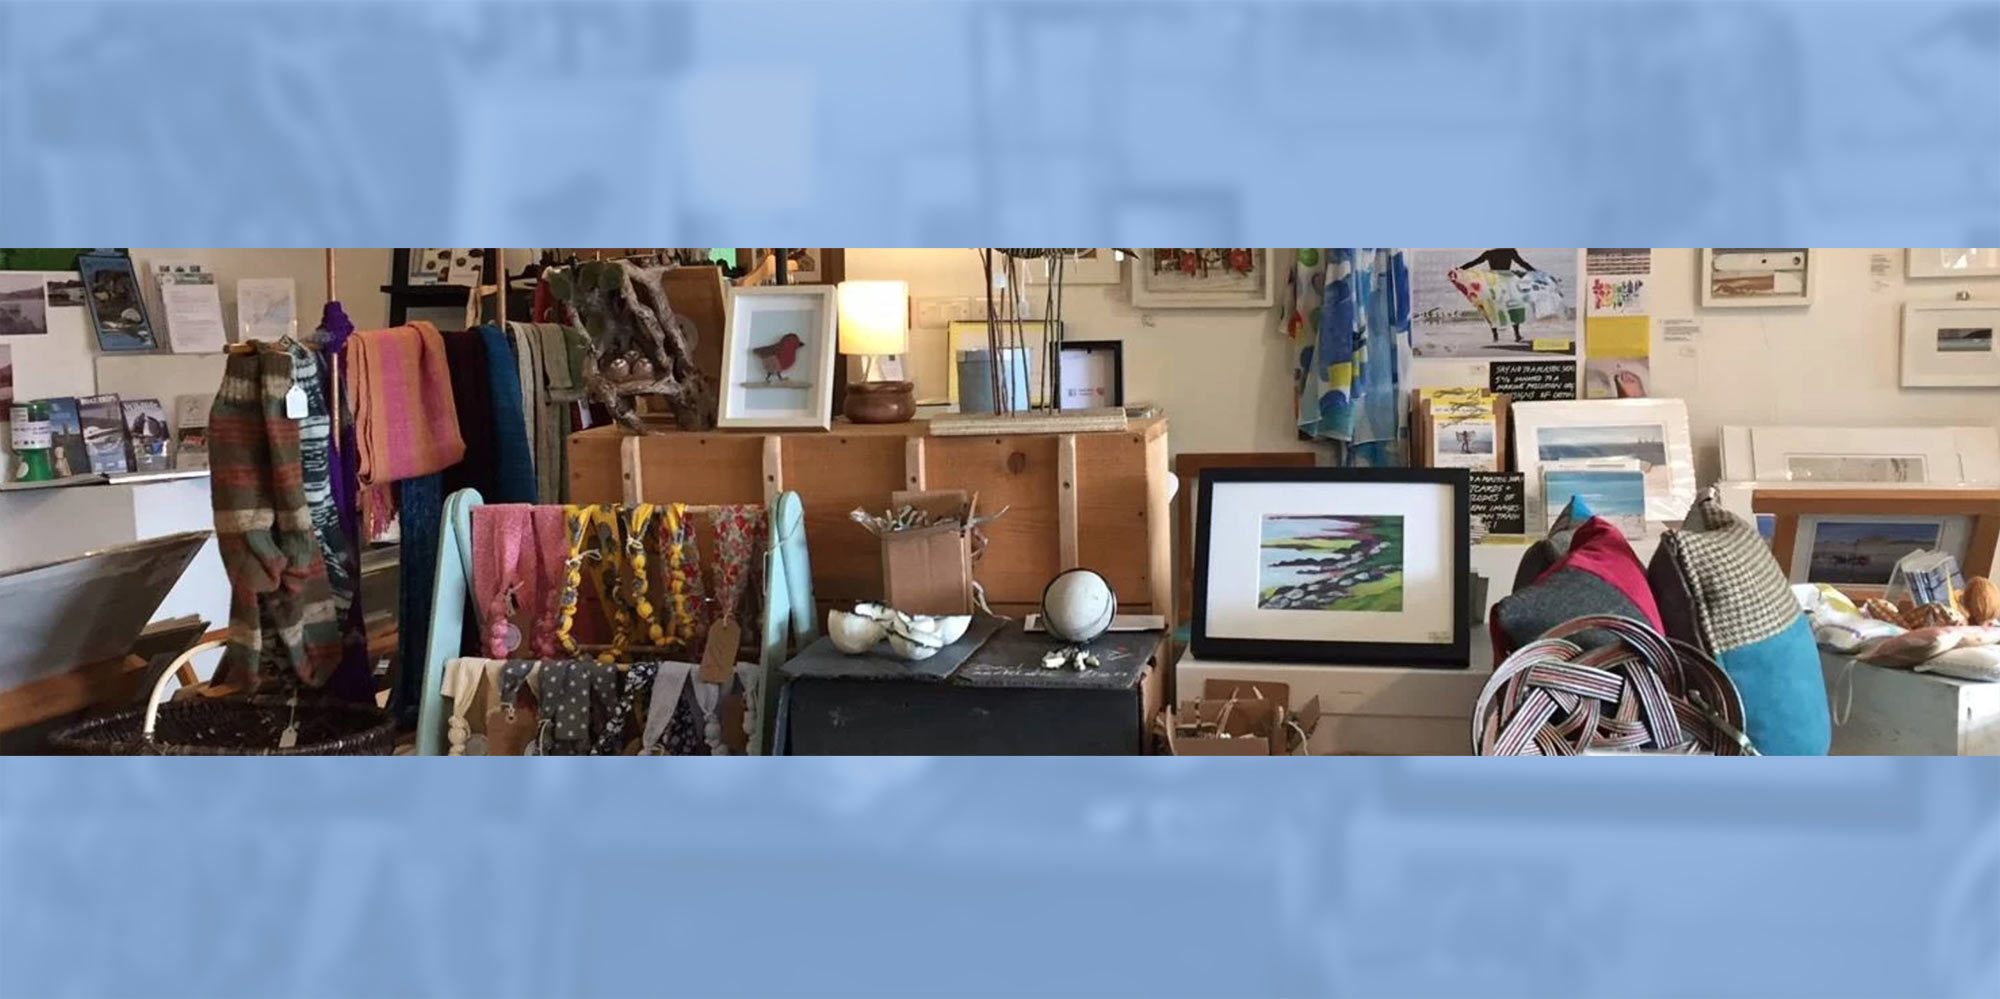 Craignish Arts & Crafts Collective